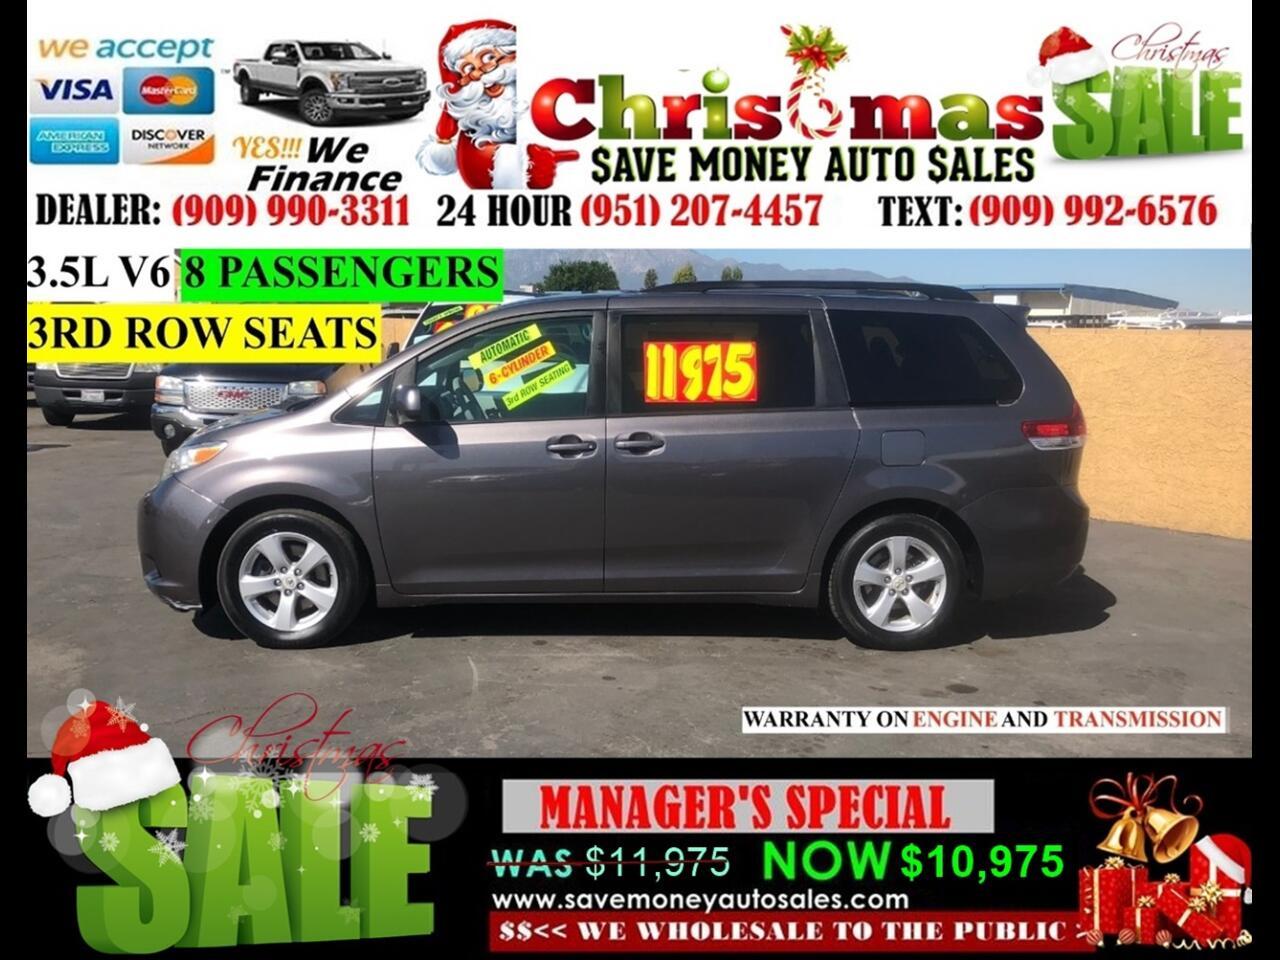 2011 Toyota Sienna LE>8 PASSENGERS, 3RD ROW SEATS!!!